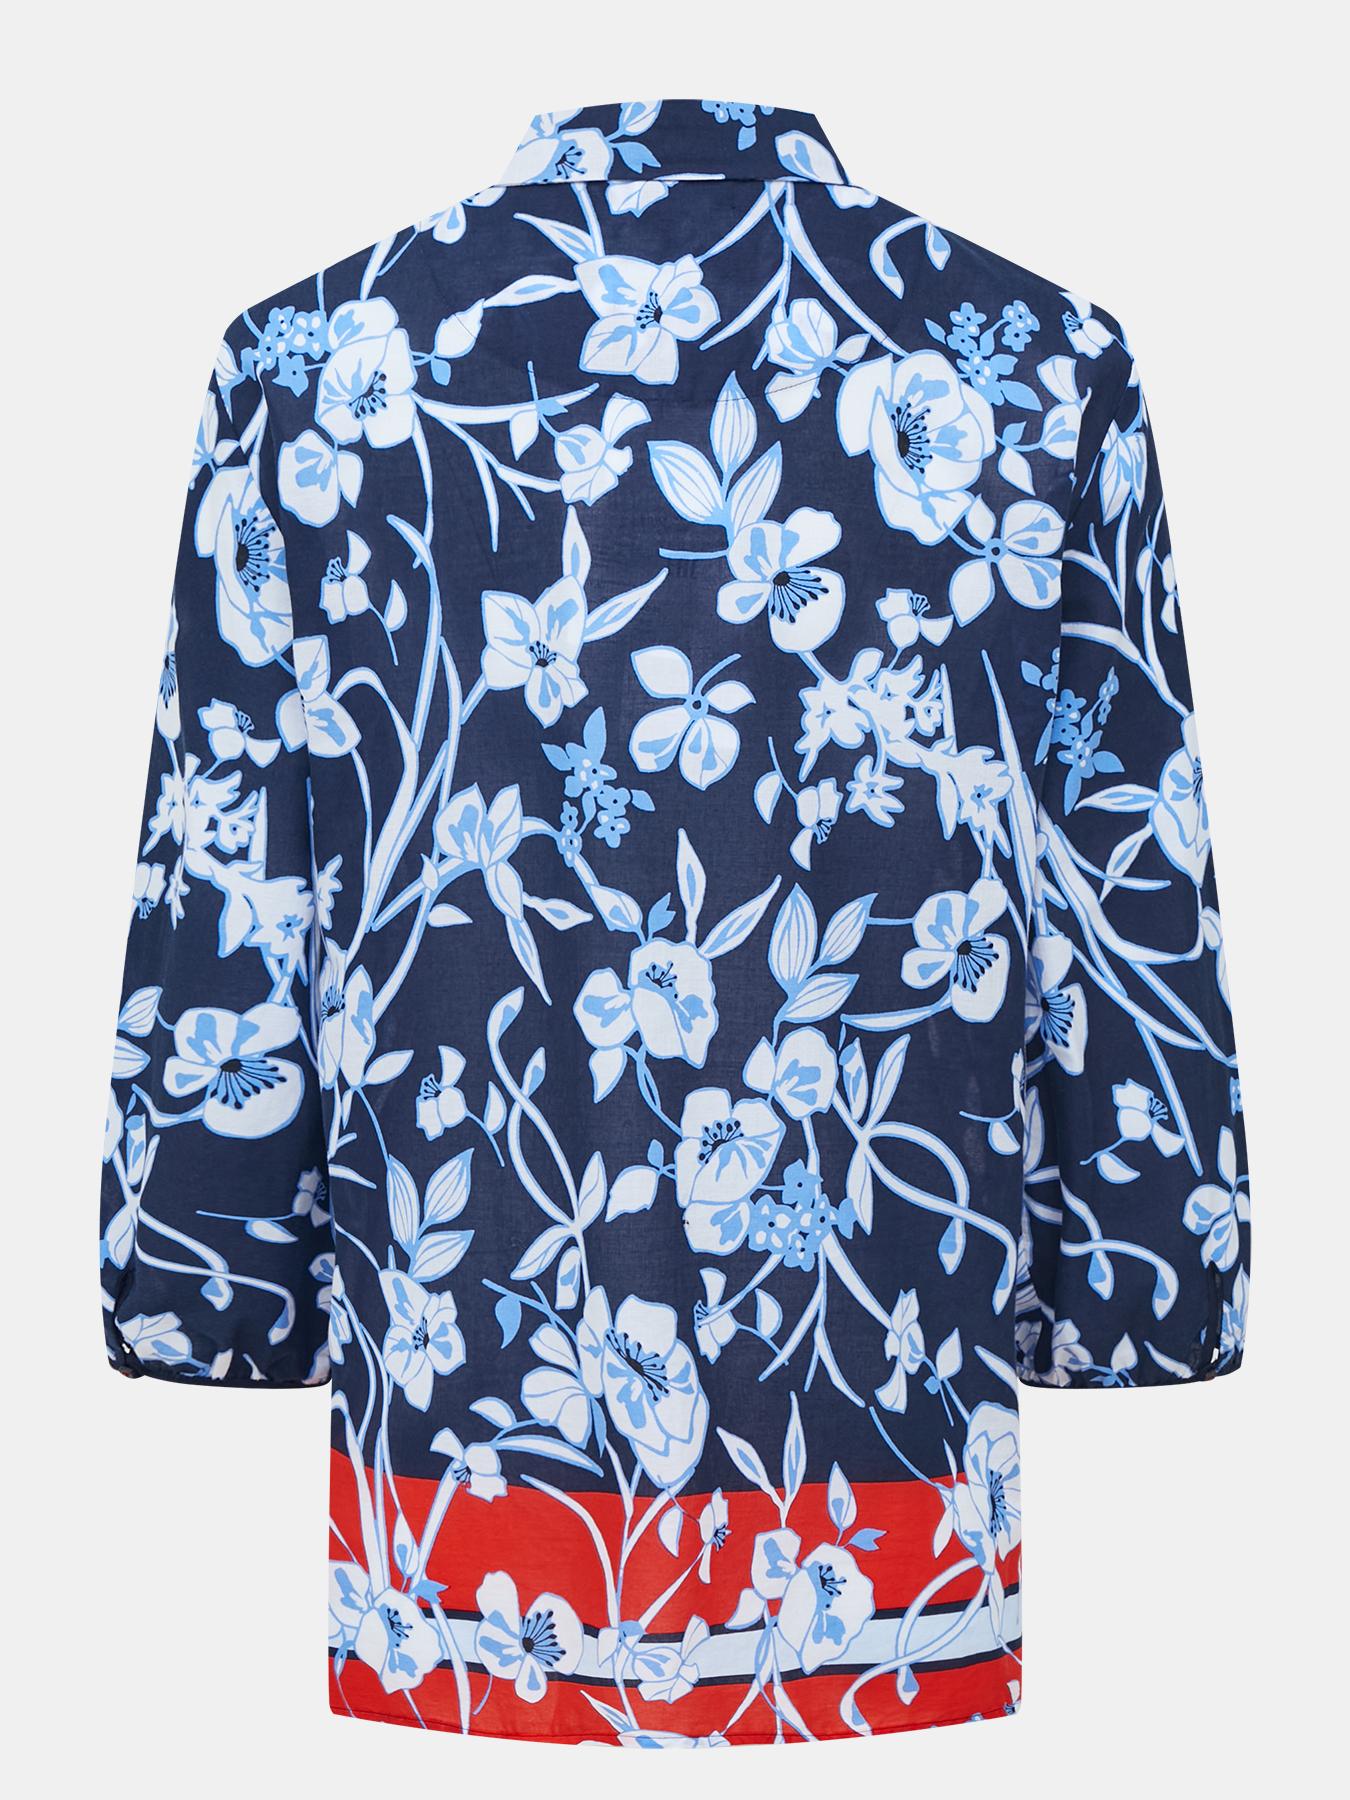 Блузка Gerry Weber Casual Рубашка блузка gerry weber рубашка